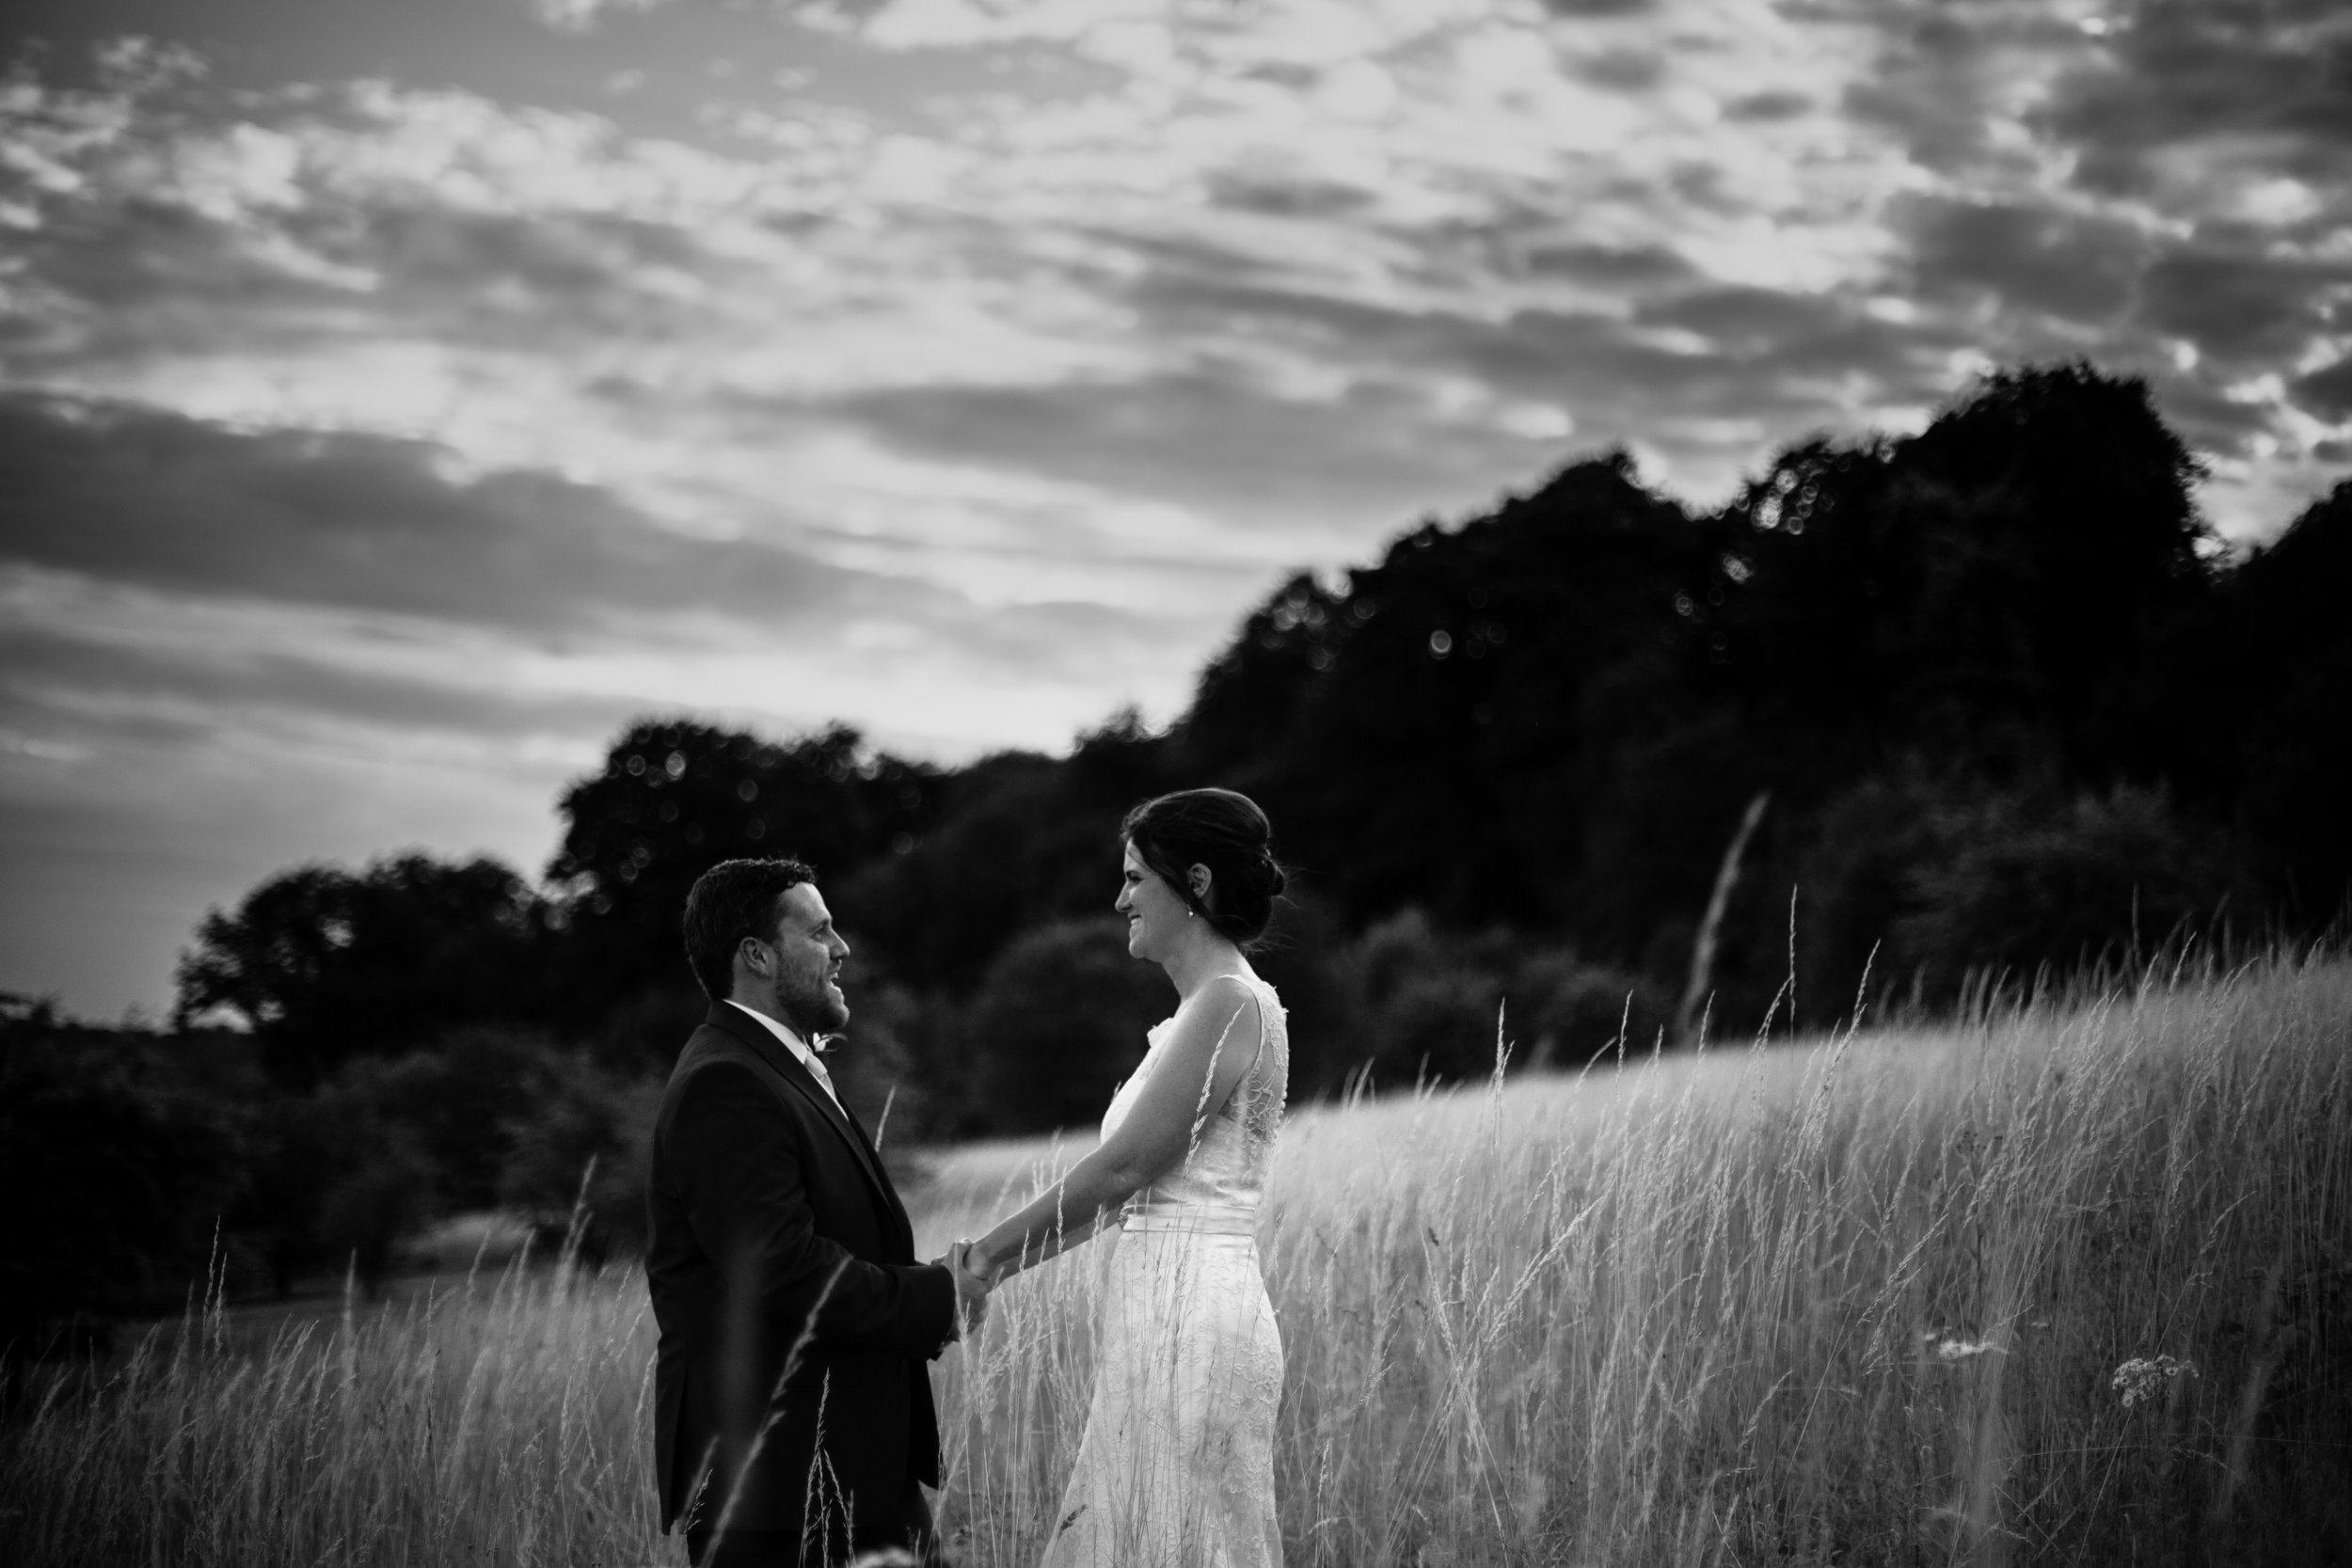 reigate-surrey-london-wedding-photography-group-formal-shot-reception-woldingham-golf-club-bridal-portrait-103